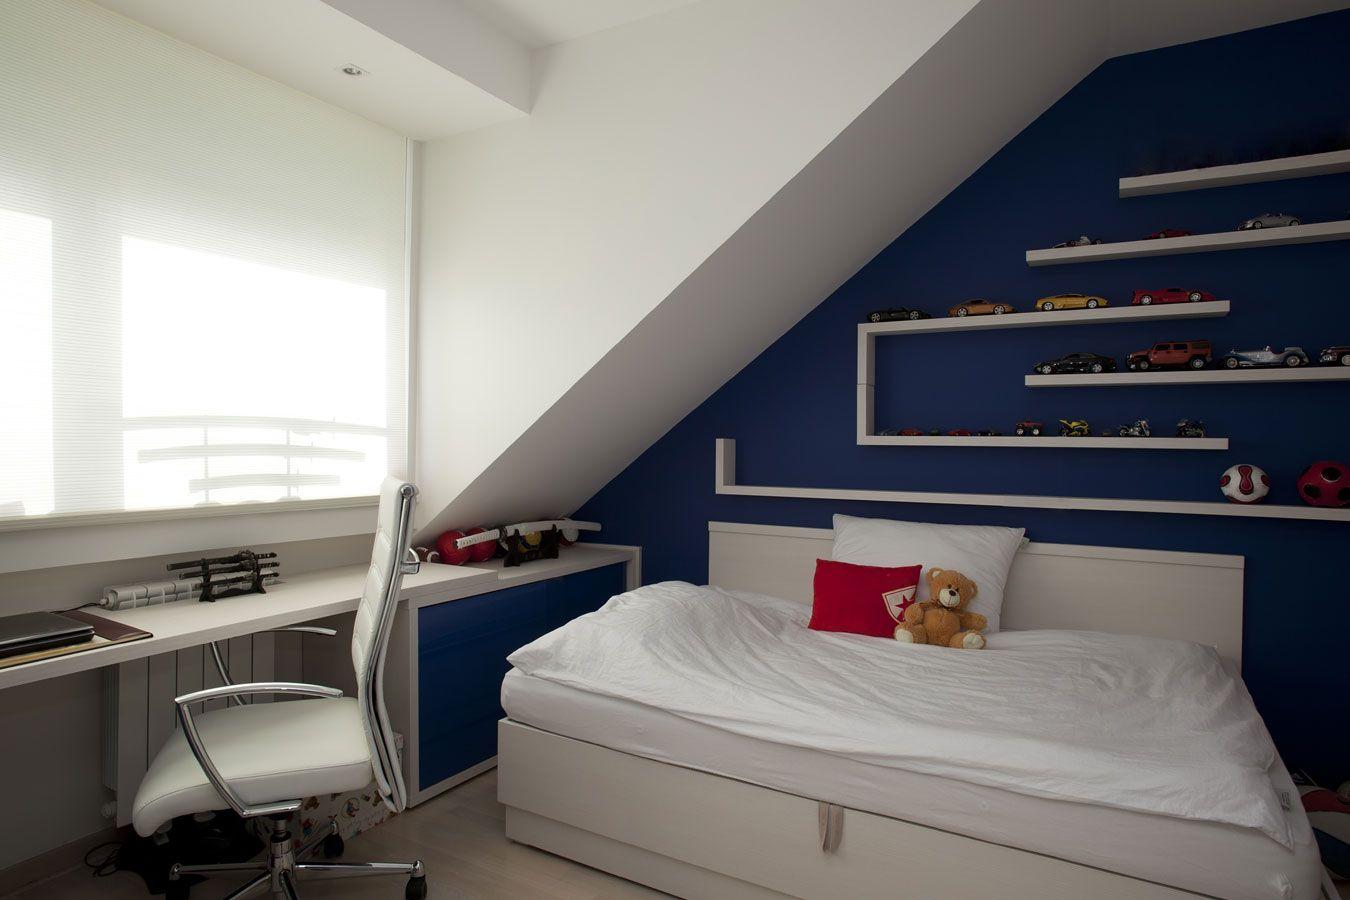 Kleine Slaapkamer Kind : Tips kleine slaapkamer kind : zolderkamer met dakkapel inrichten